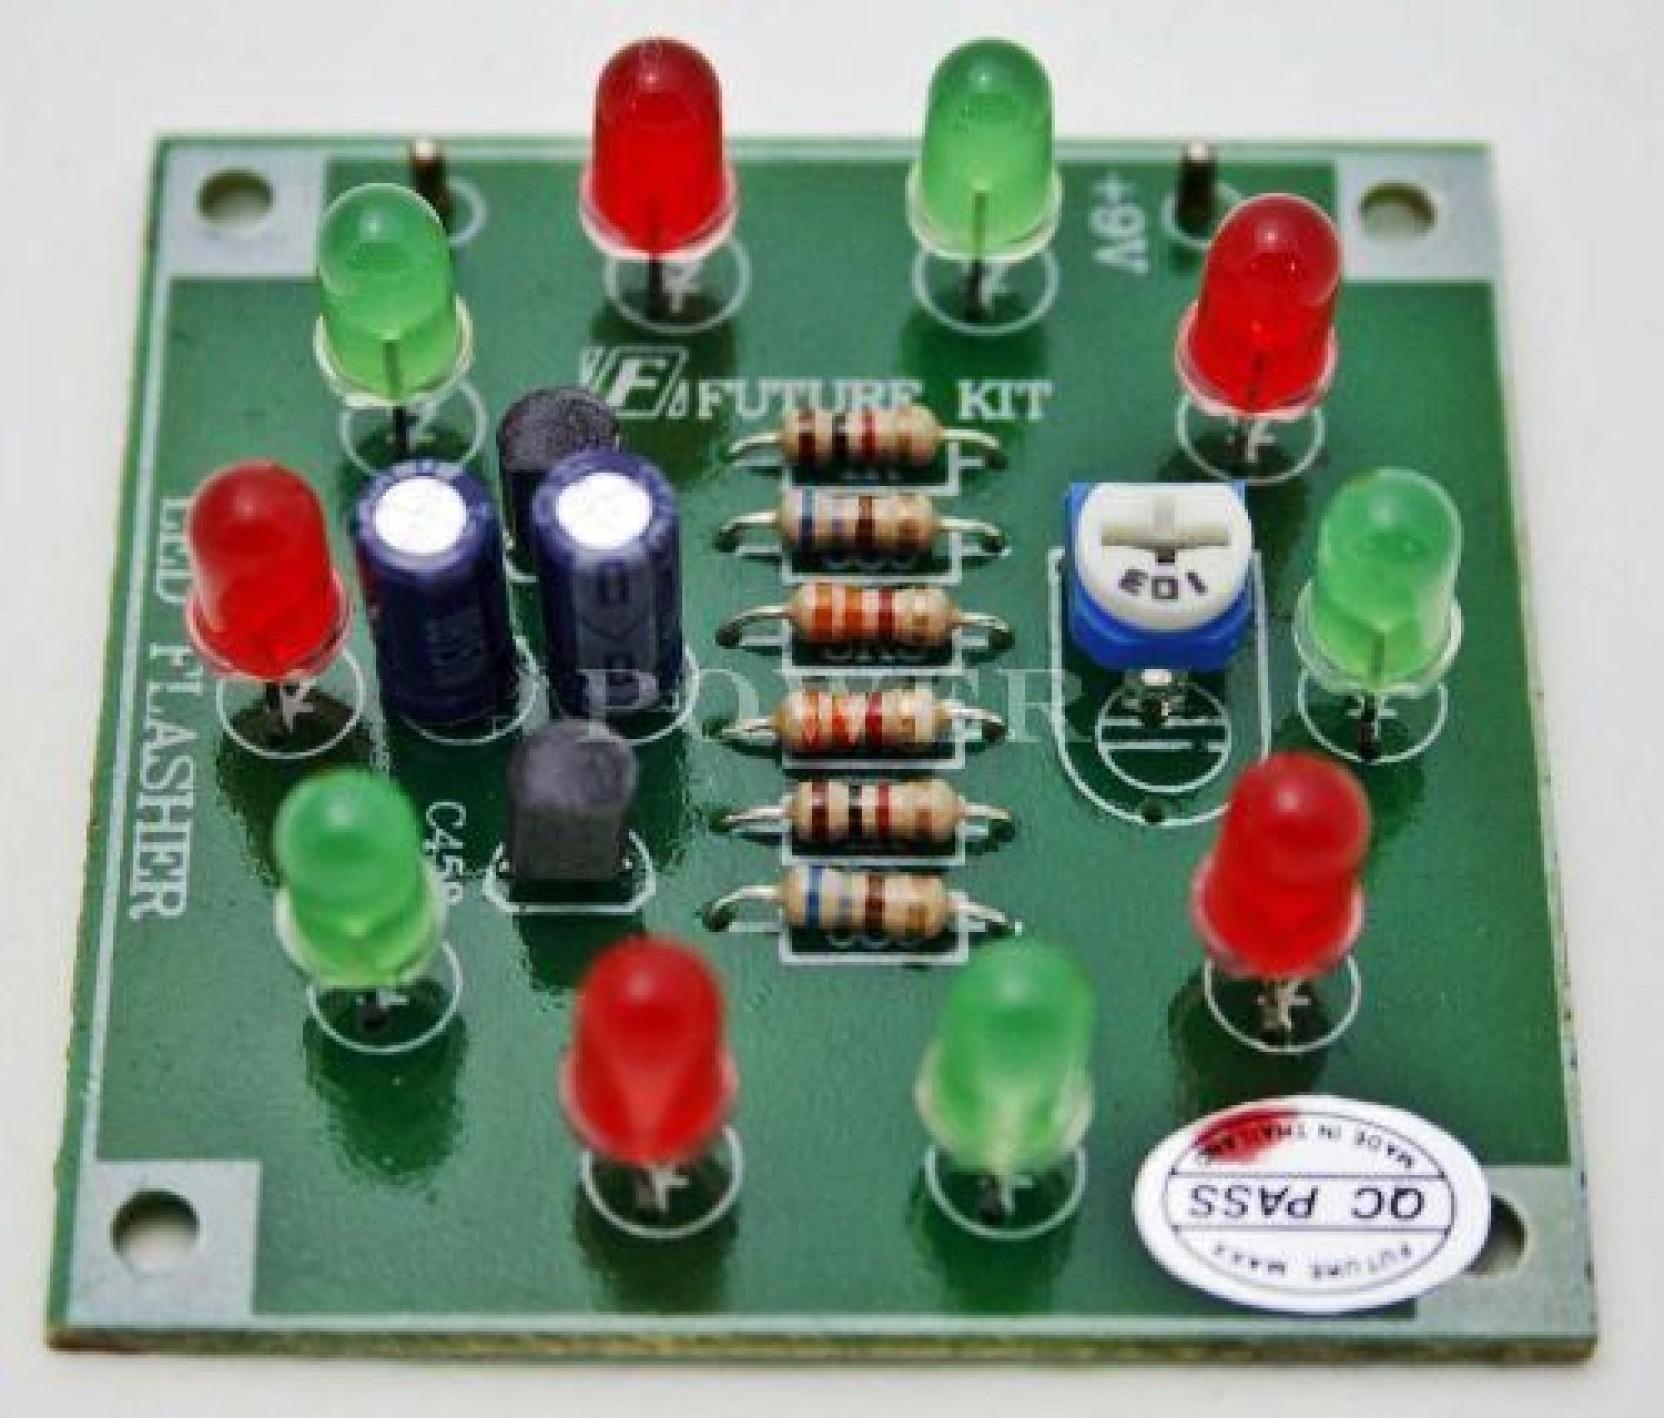 Generic Led Flasher 10 Dot Electronic Circuit Kit Free Shipping 200w Lamp On Offer